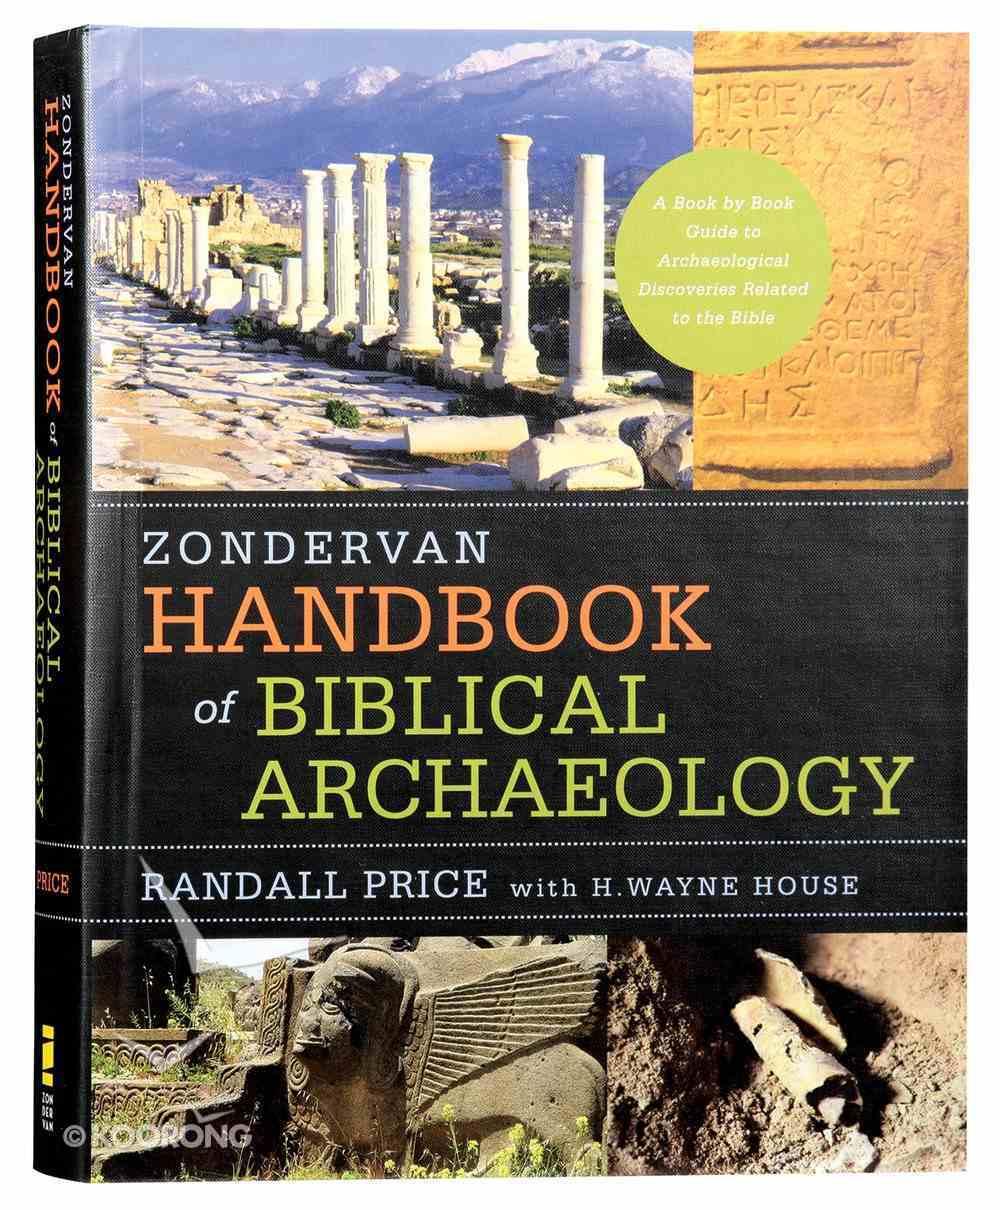 Zondervan Handbook of Biblical Archaeology Hardback